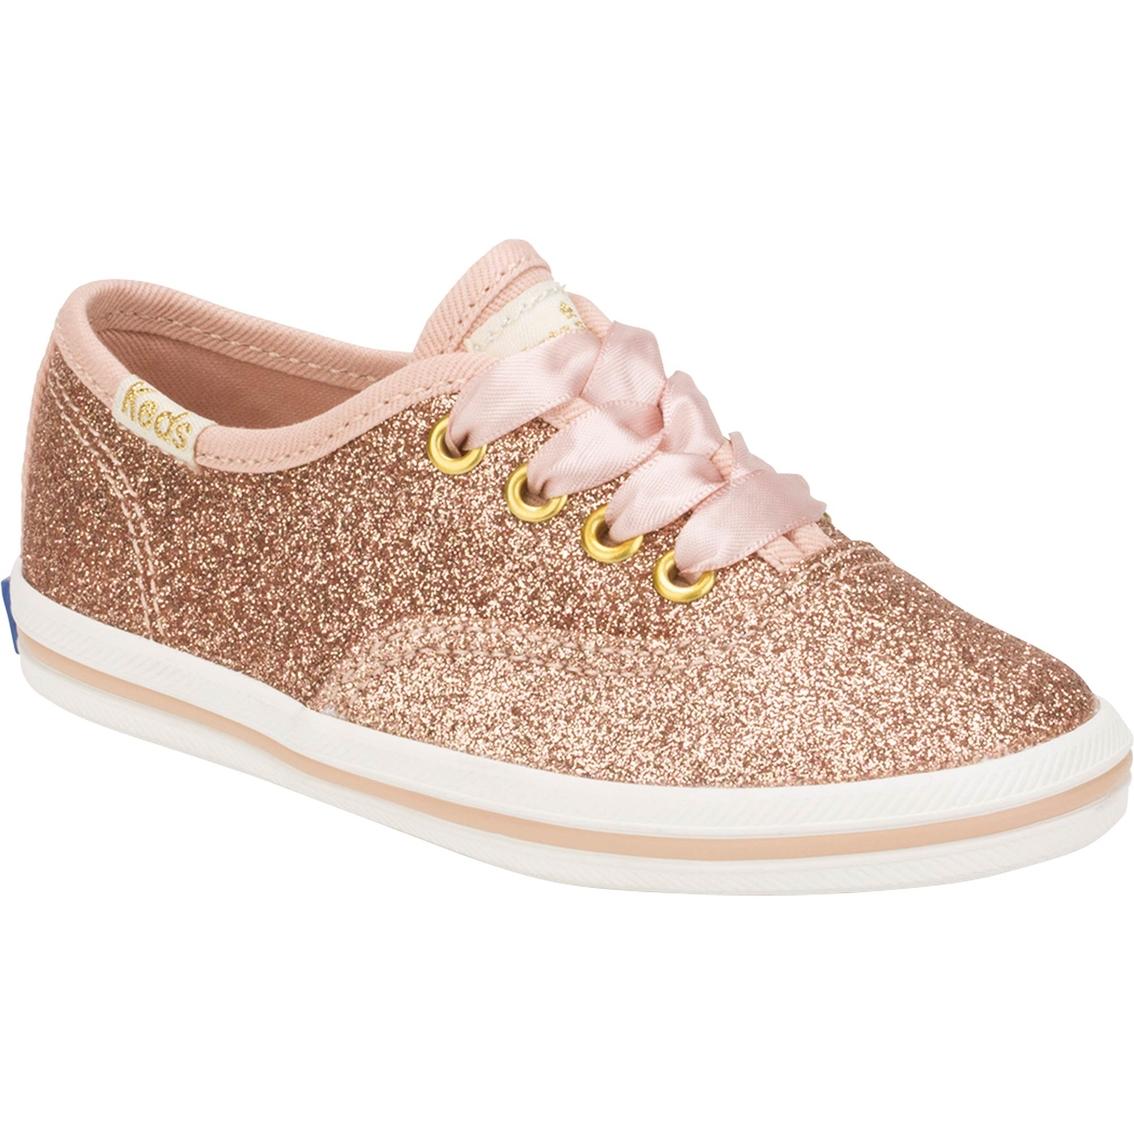 2bf99ad303af Keds For Kate Spade Toddler Girls Champion Glitter Sneakers ...